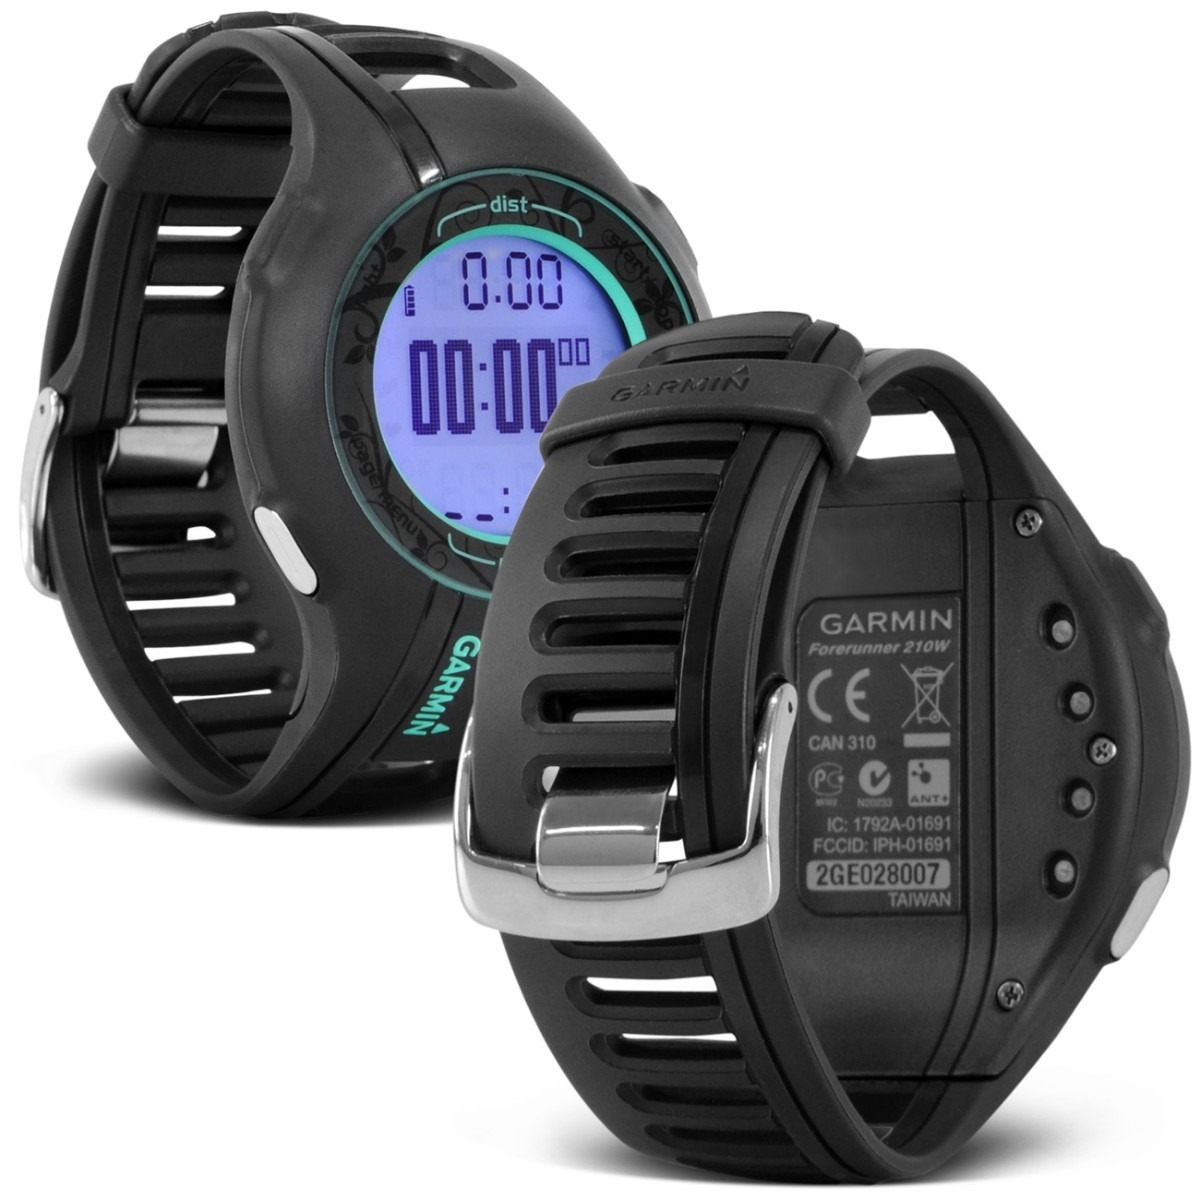 Garmin Forerunner 210 Water Resistant GPS Enabled Sports Watch